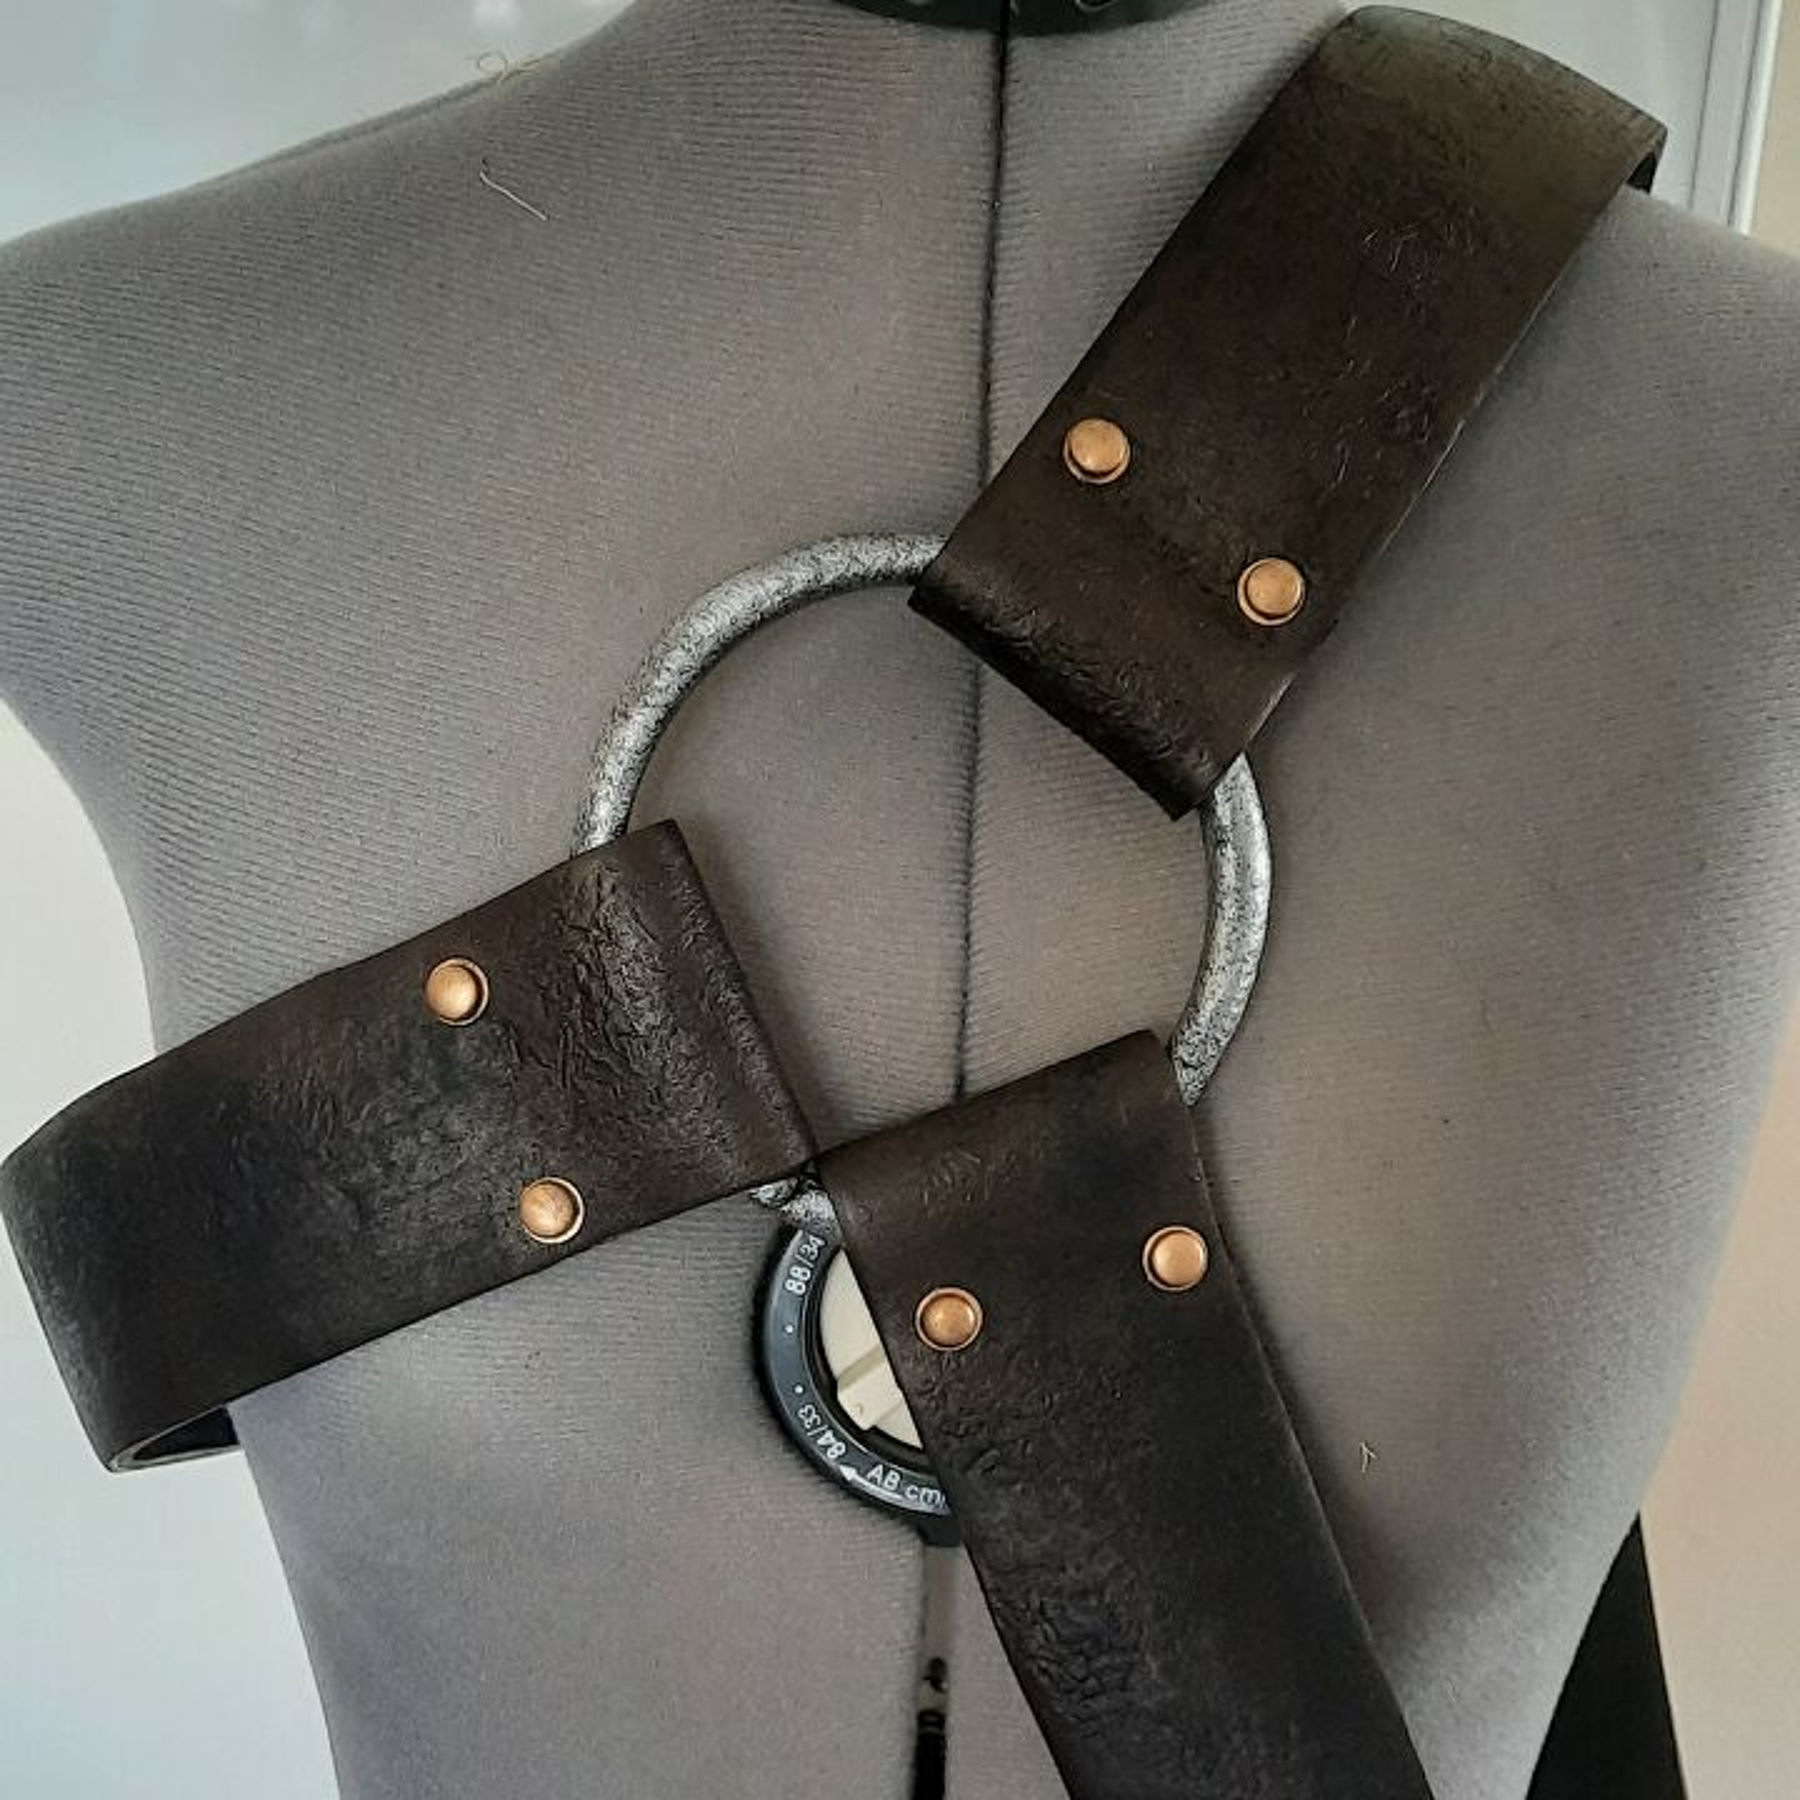 How To Make Leather Using EVA Foam